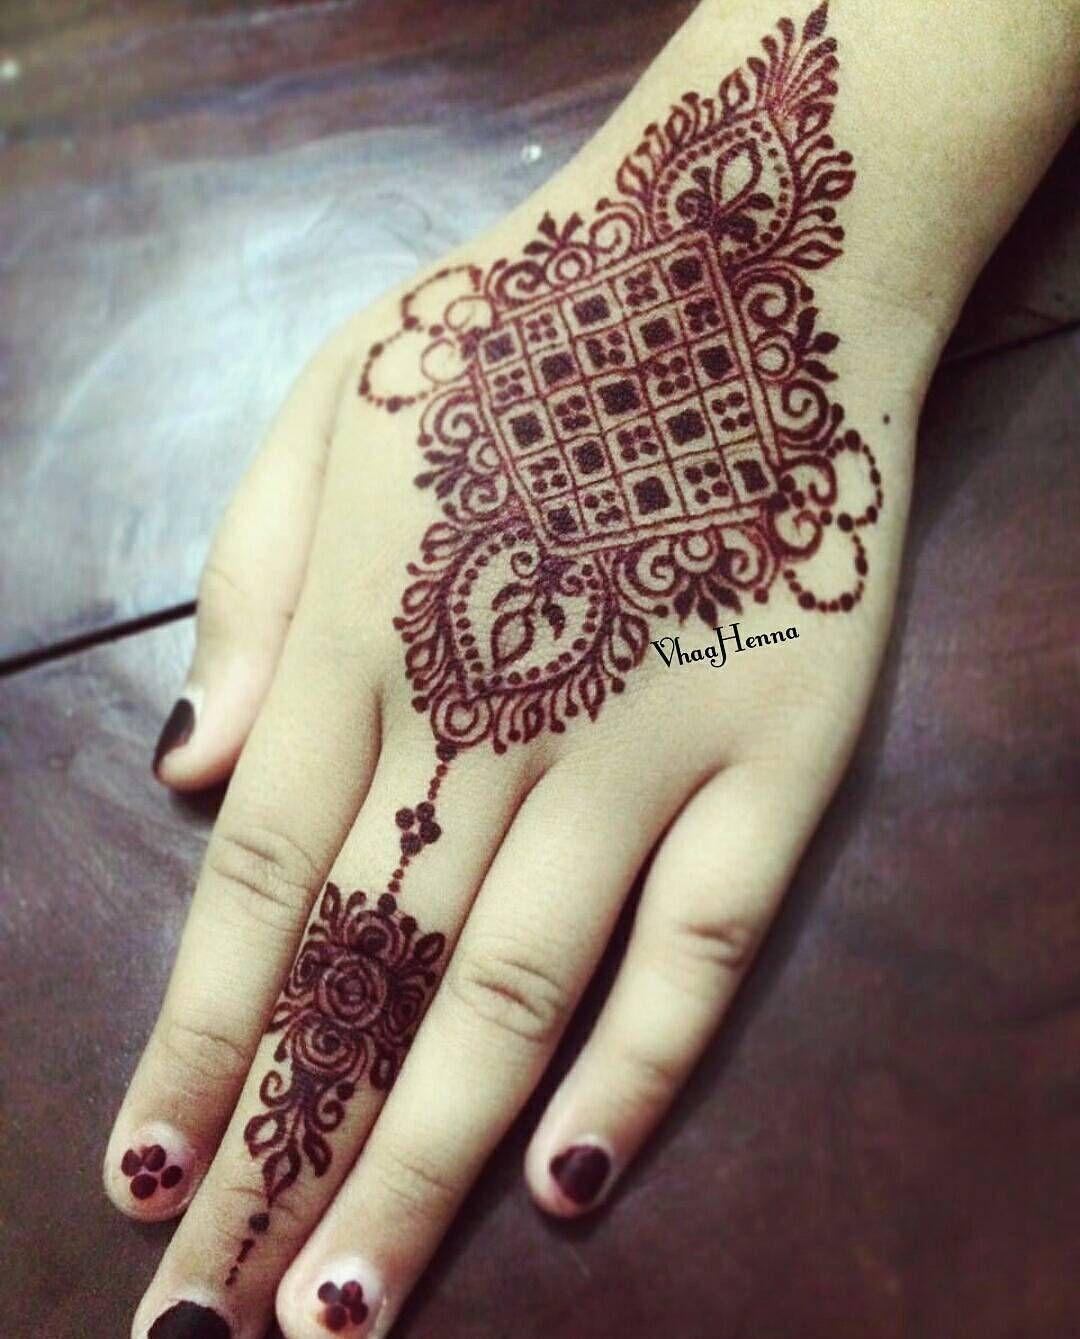 Contoh Ukiran Henna : contoh, ukiran, henna, Gambar, Henna, Untuk, Pemula, Terupdate, Tuttohenna